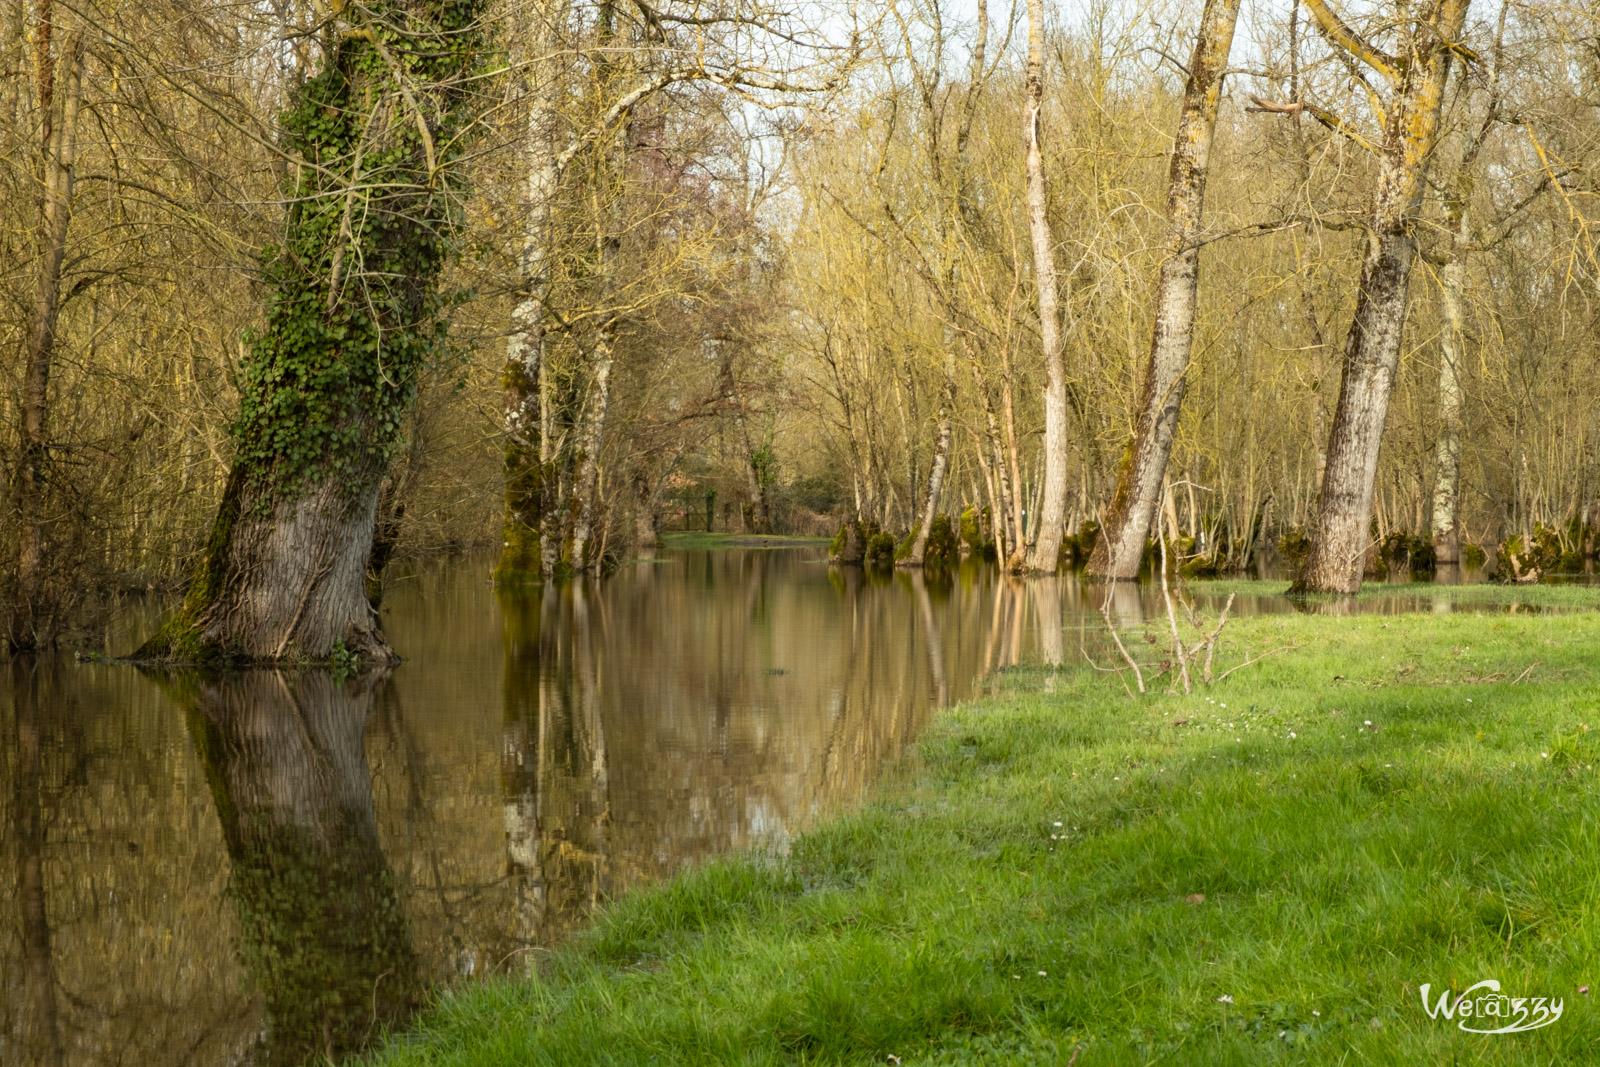 Courçon, France, Marais, Nature, Poitevin